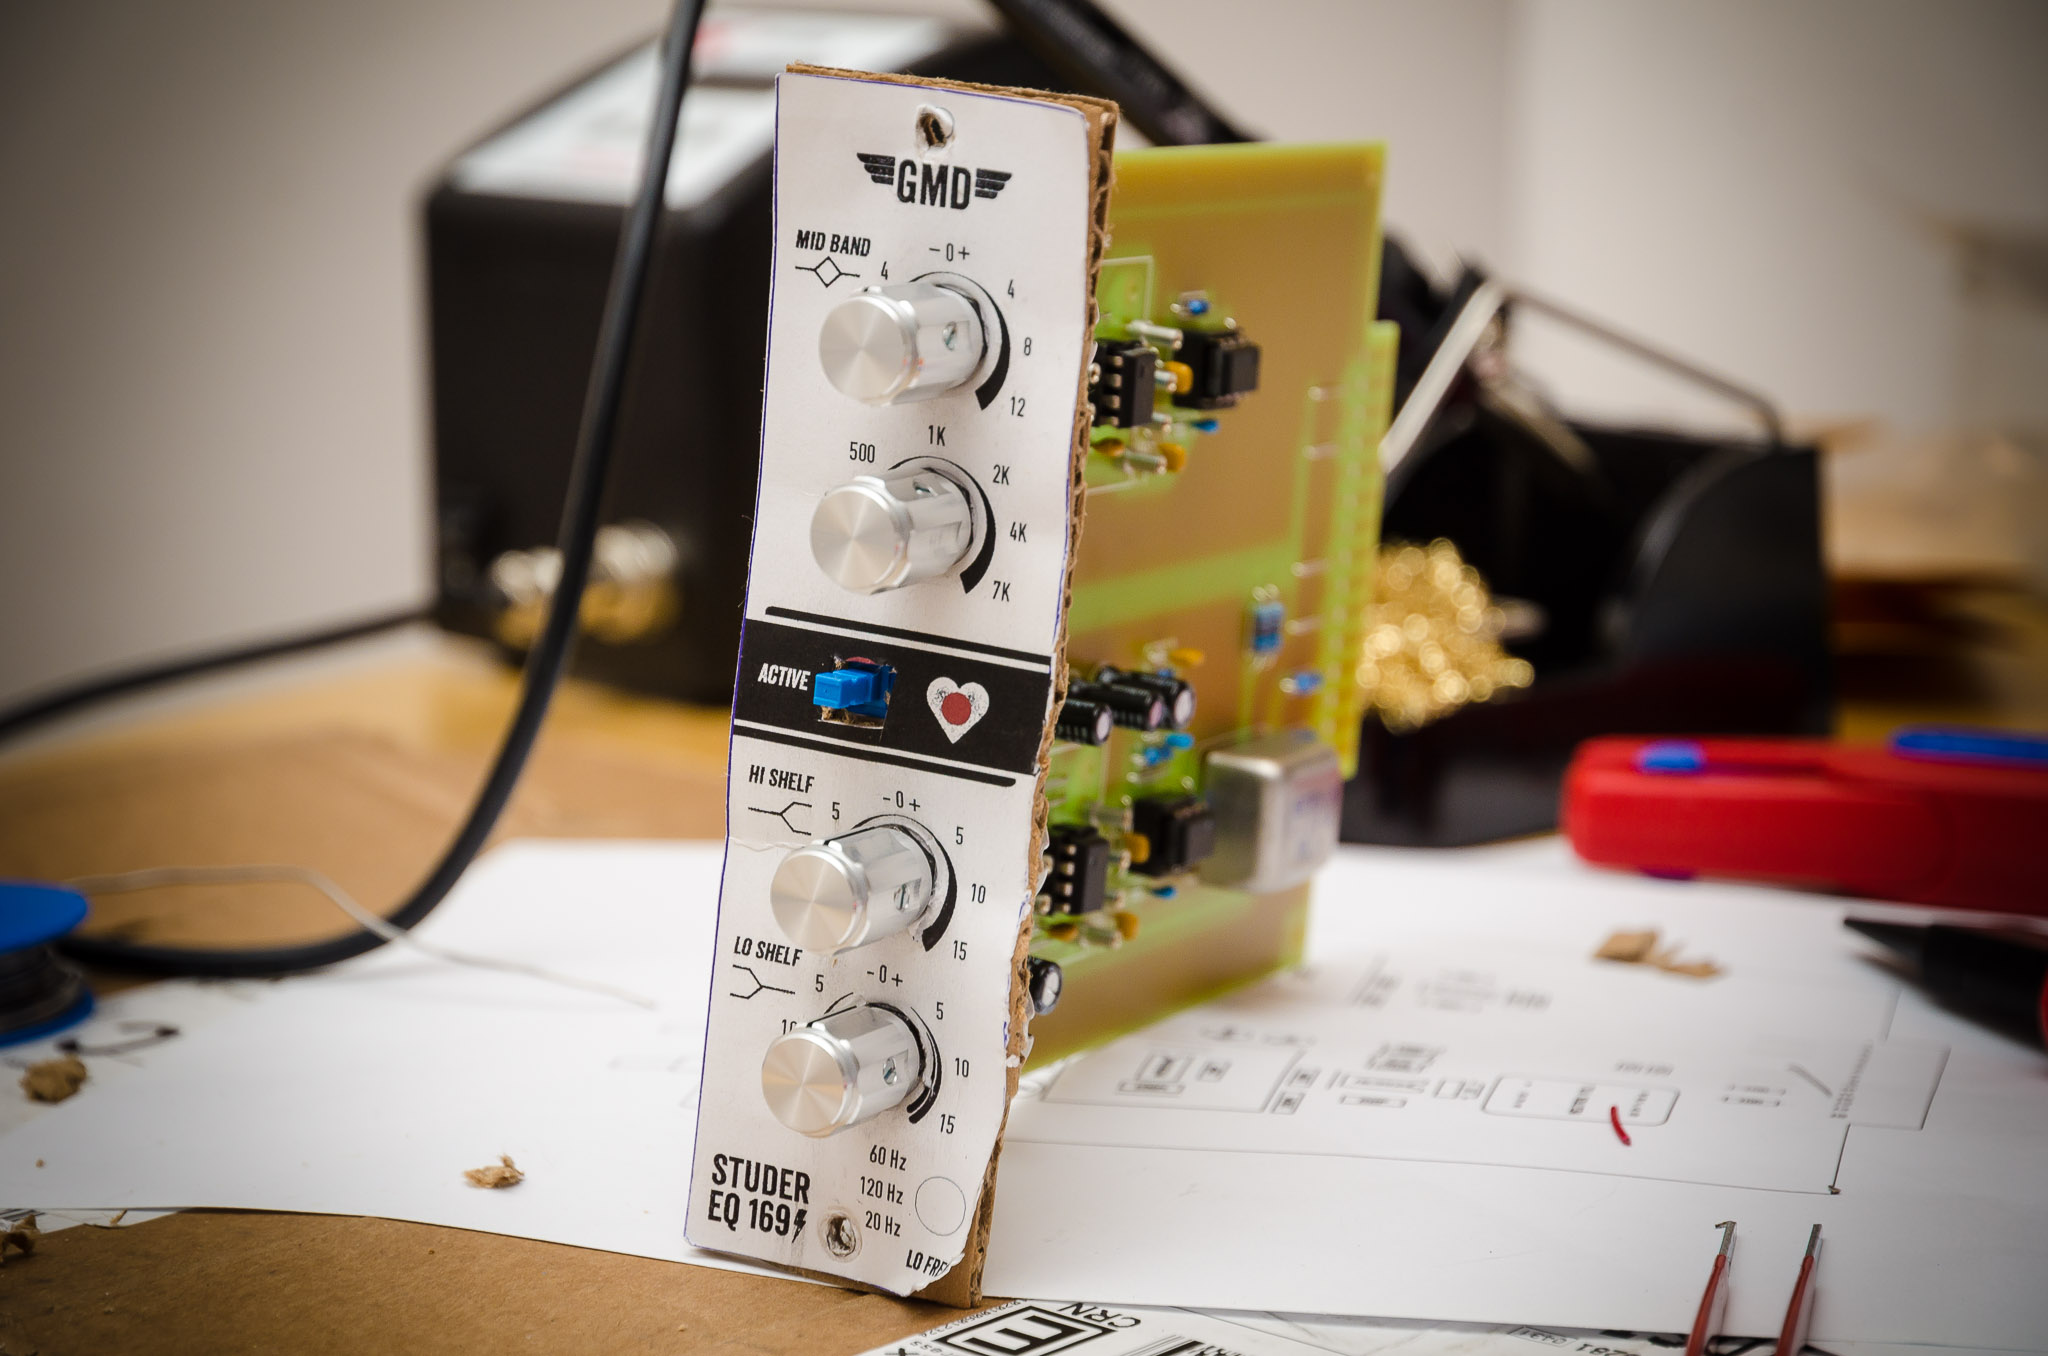 API-500-Modul-mit-selbst-gestalteter-fron-testausdruck